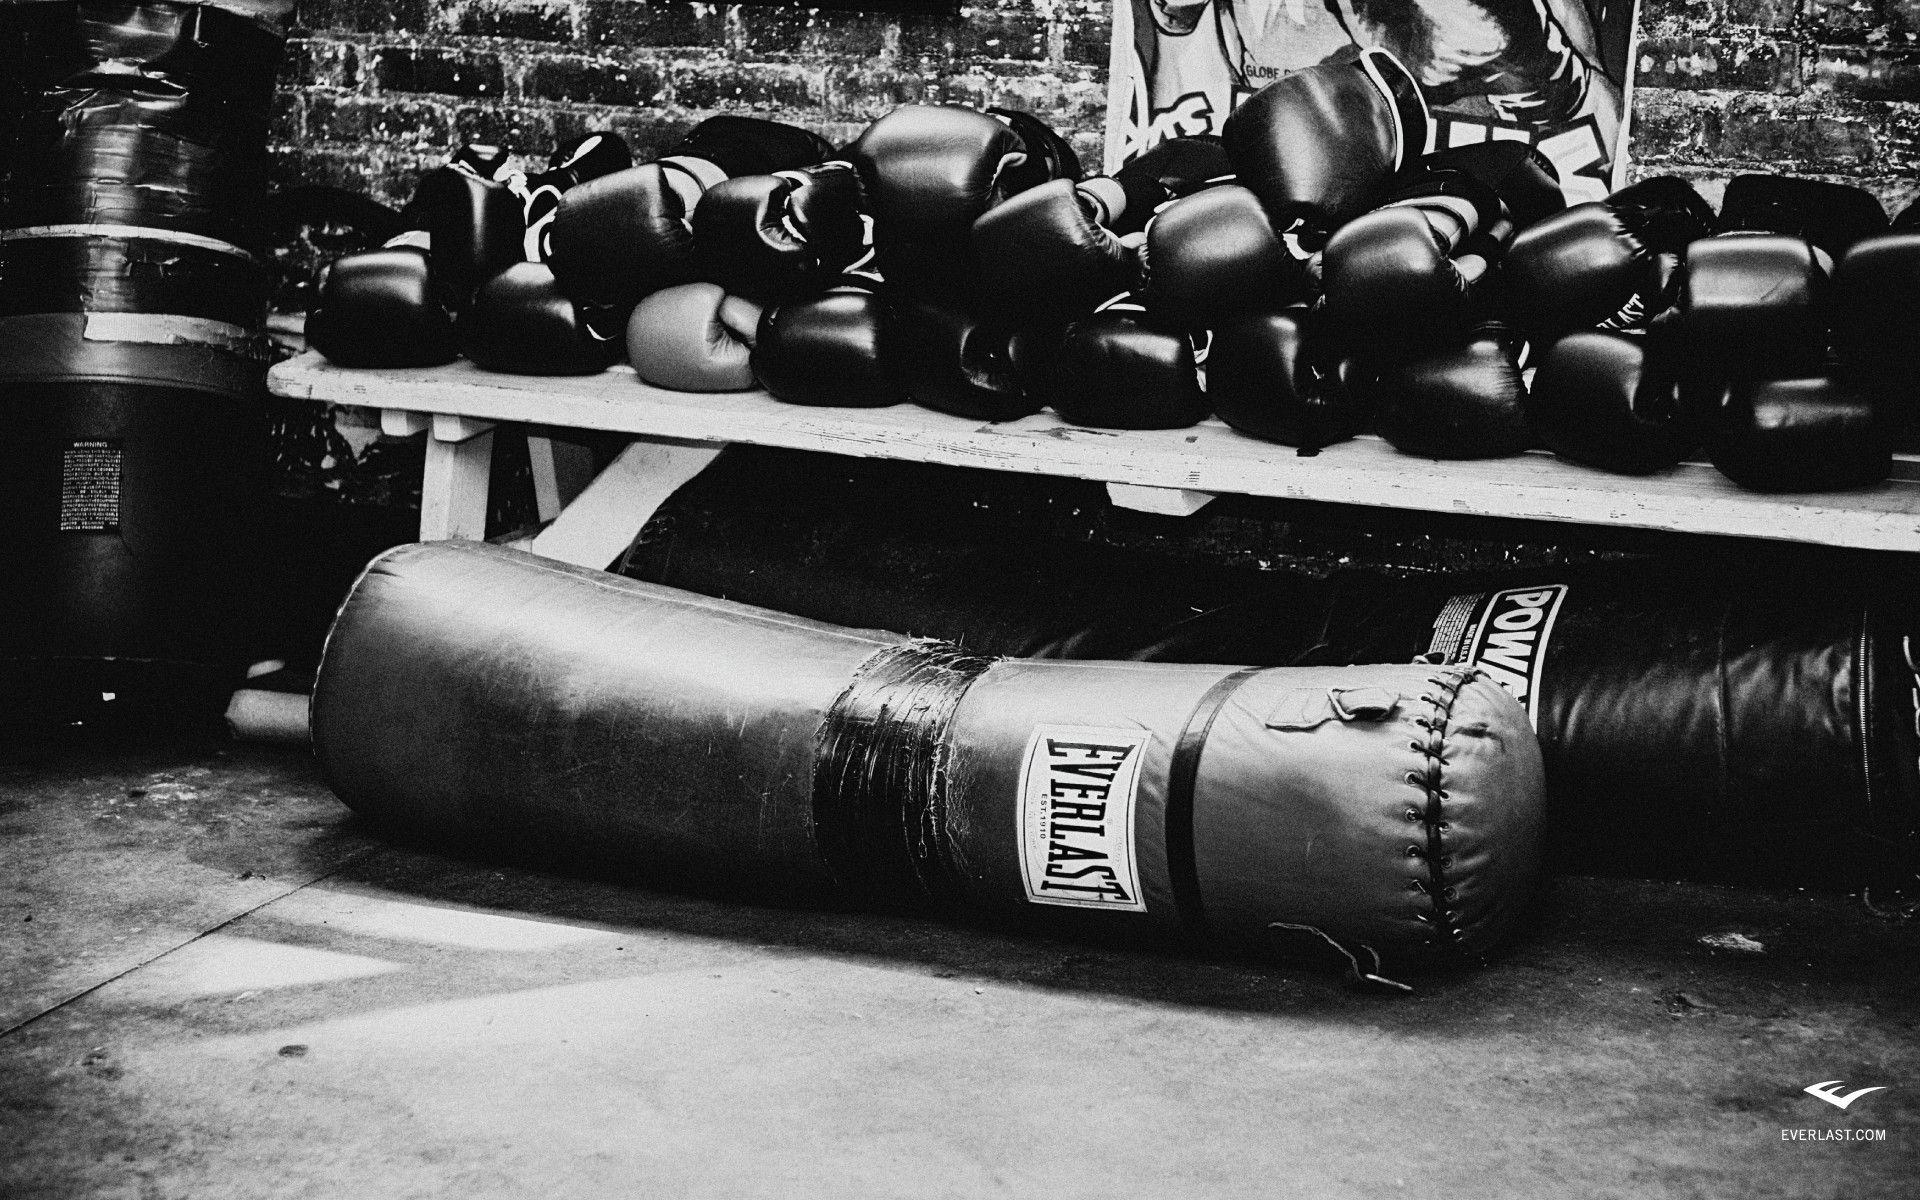 … 1920 × 1200 in Boxing-Ring-Wallpaper-16.